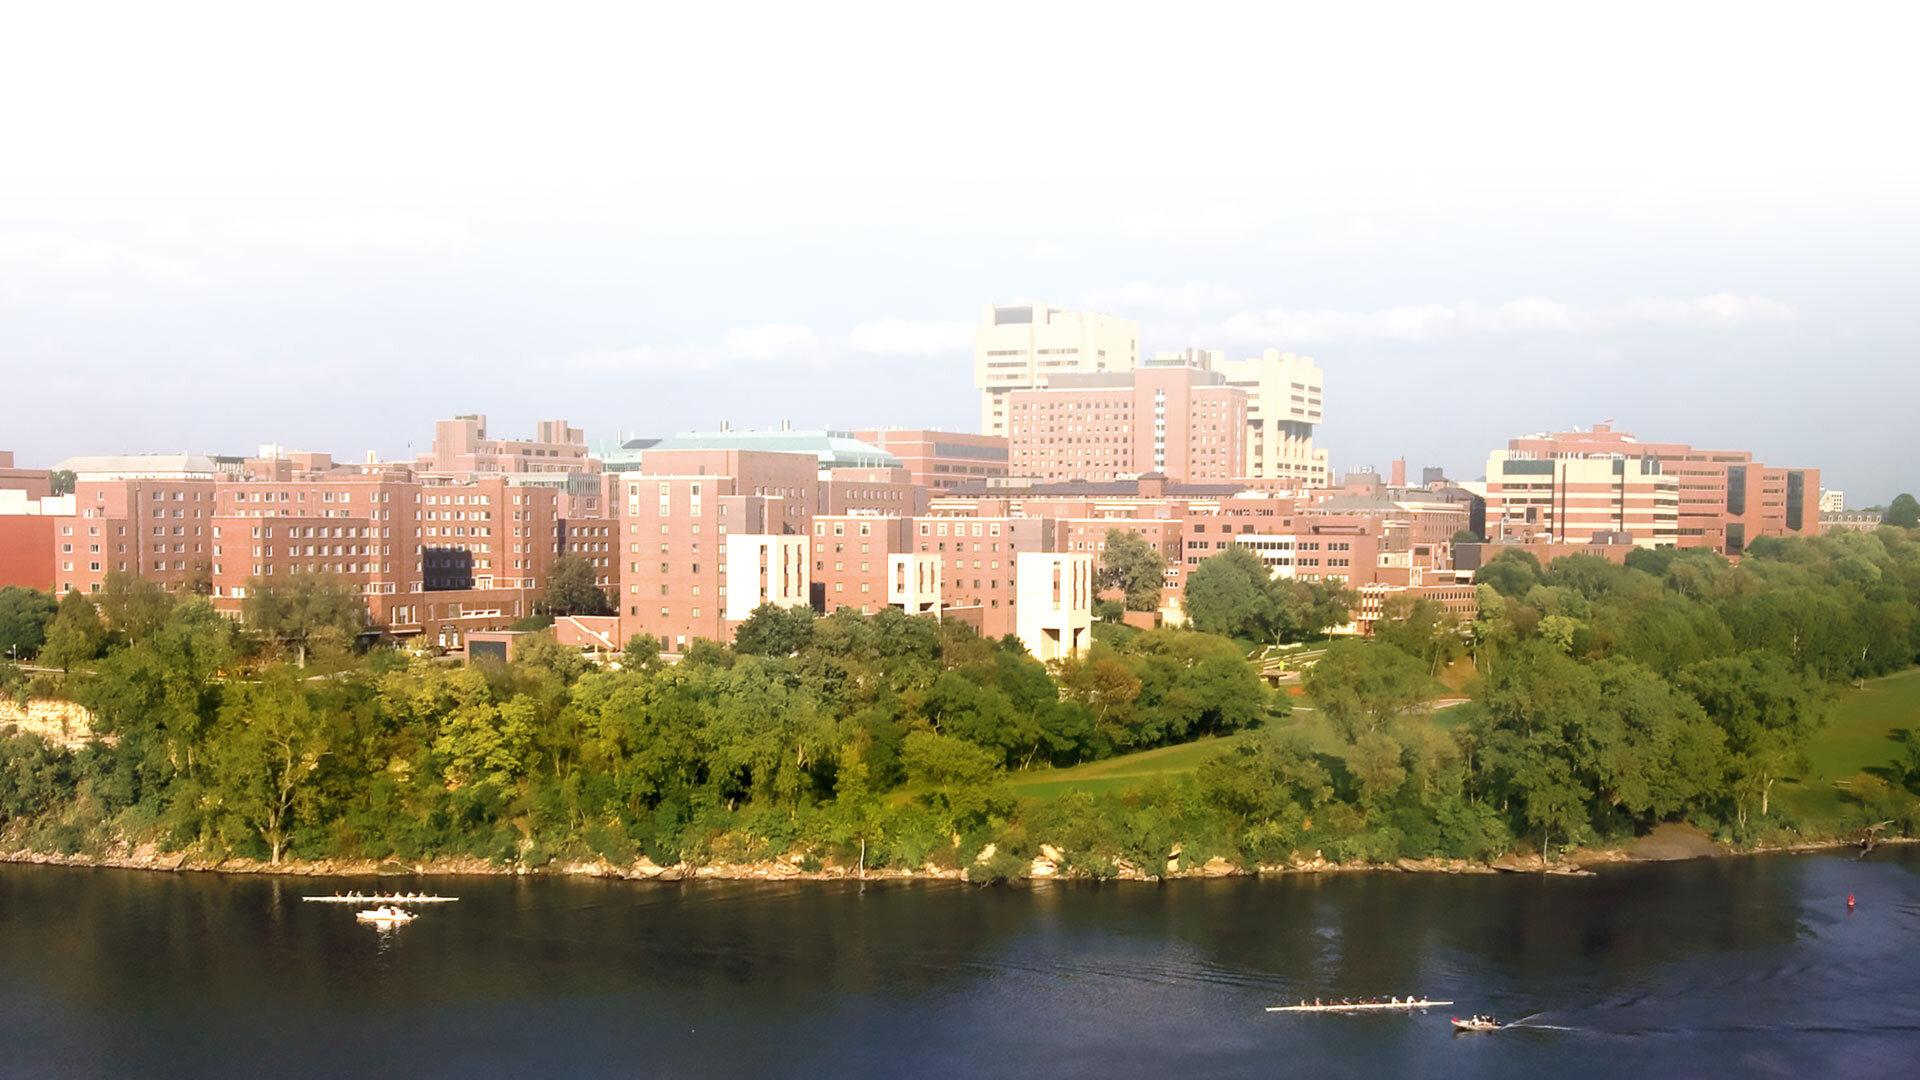 University of Minnesota building